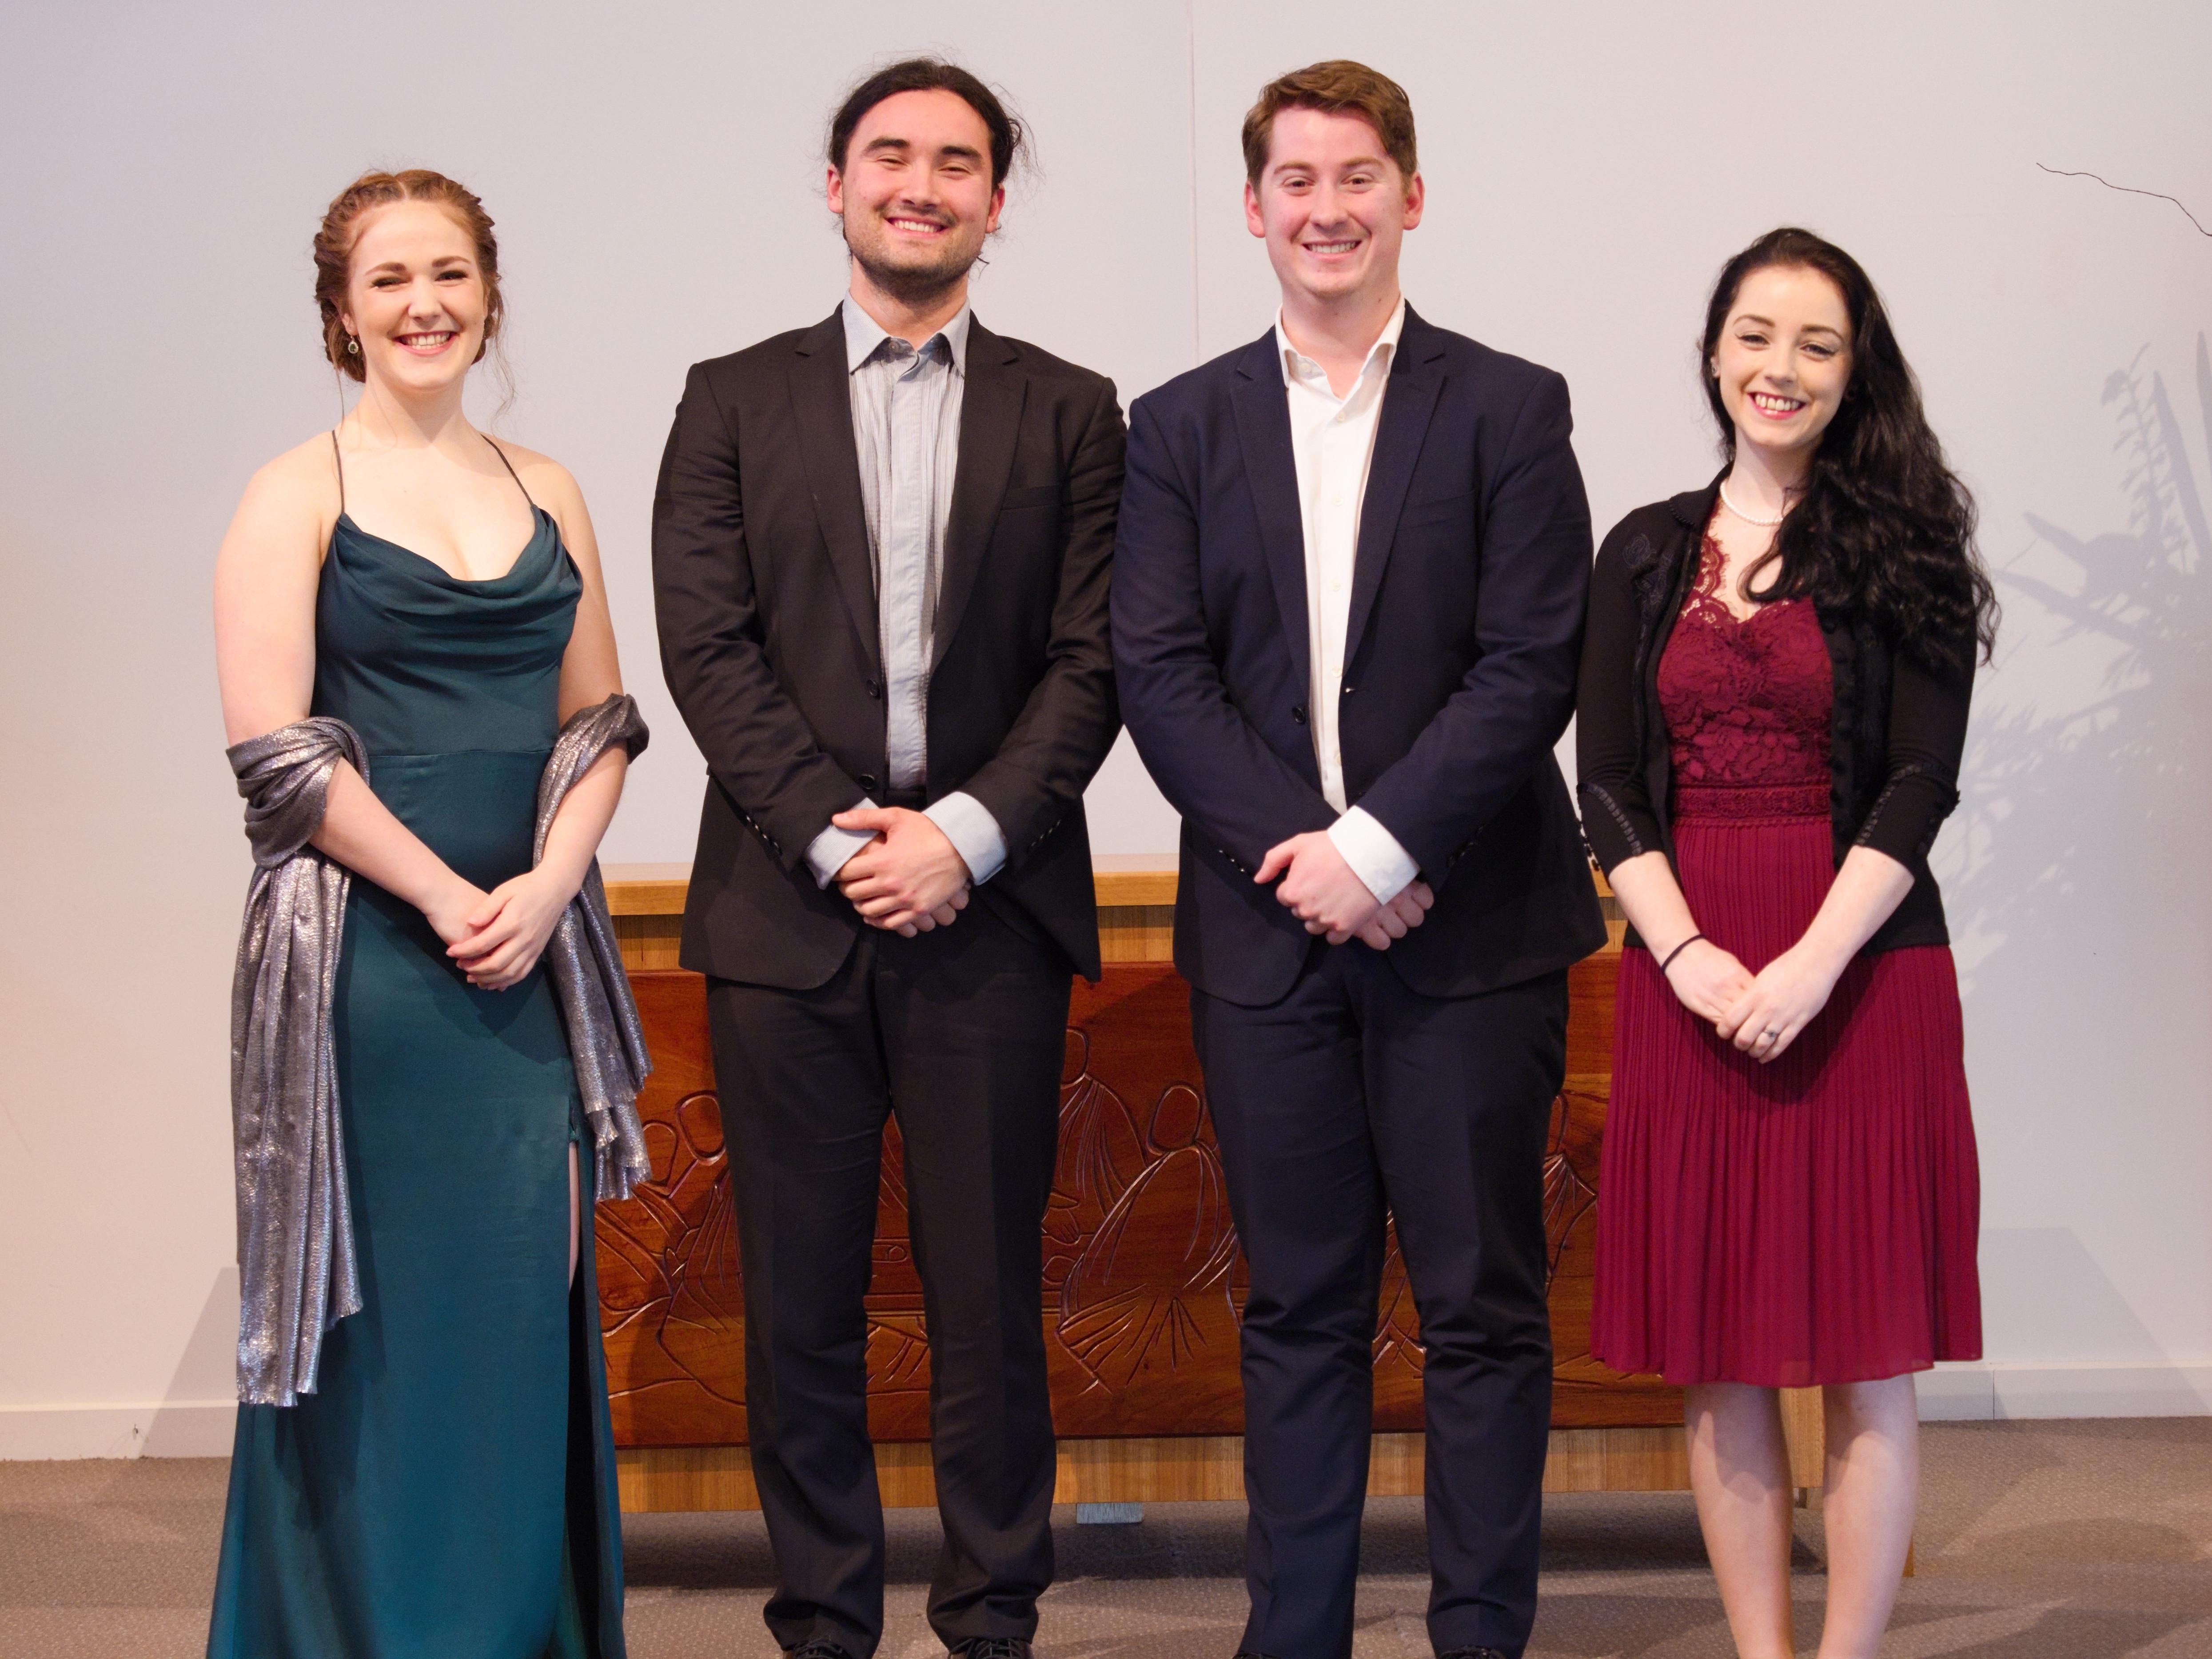 WGE Classical Vocal S 715 1st James Emerson, 2nd Christina Keen, 3rd Callum MacDonald, HM Maureen Doris